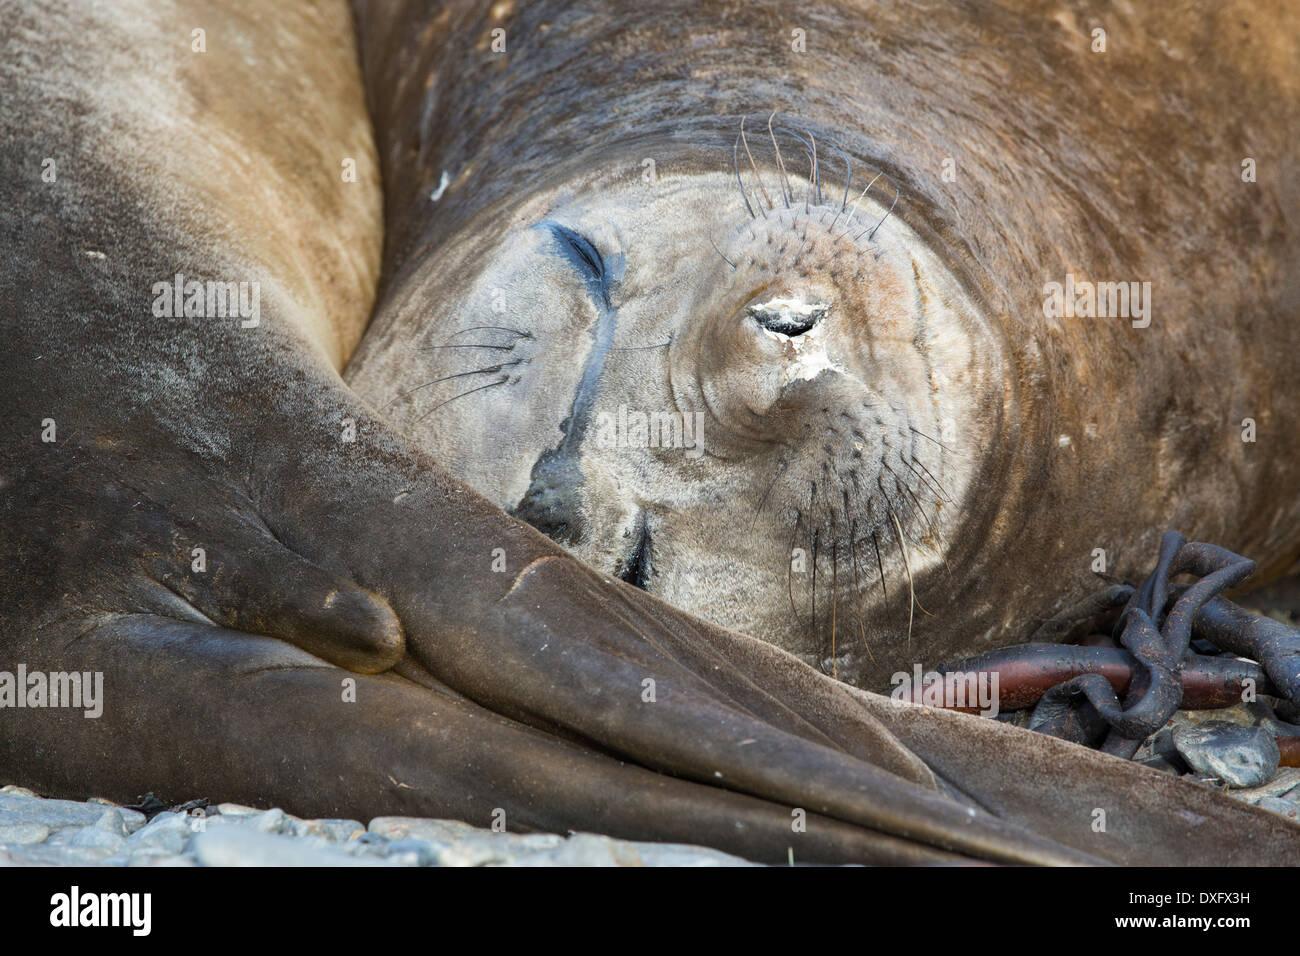 Southern Elephant Seal; Mirounga leonina, on Prion Island, South Georgia, Antarctica. - Stock Image